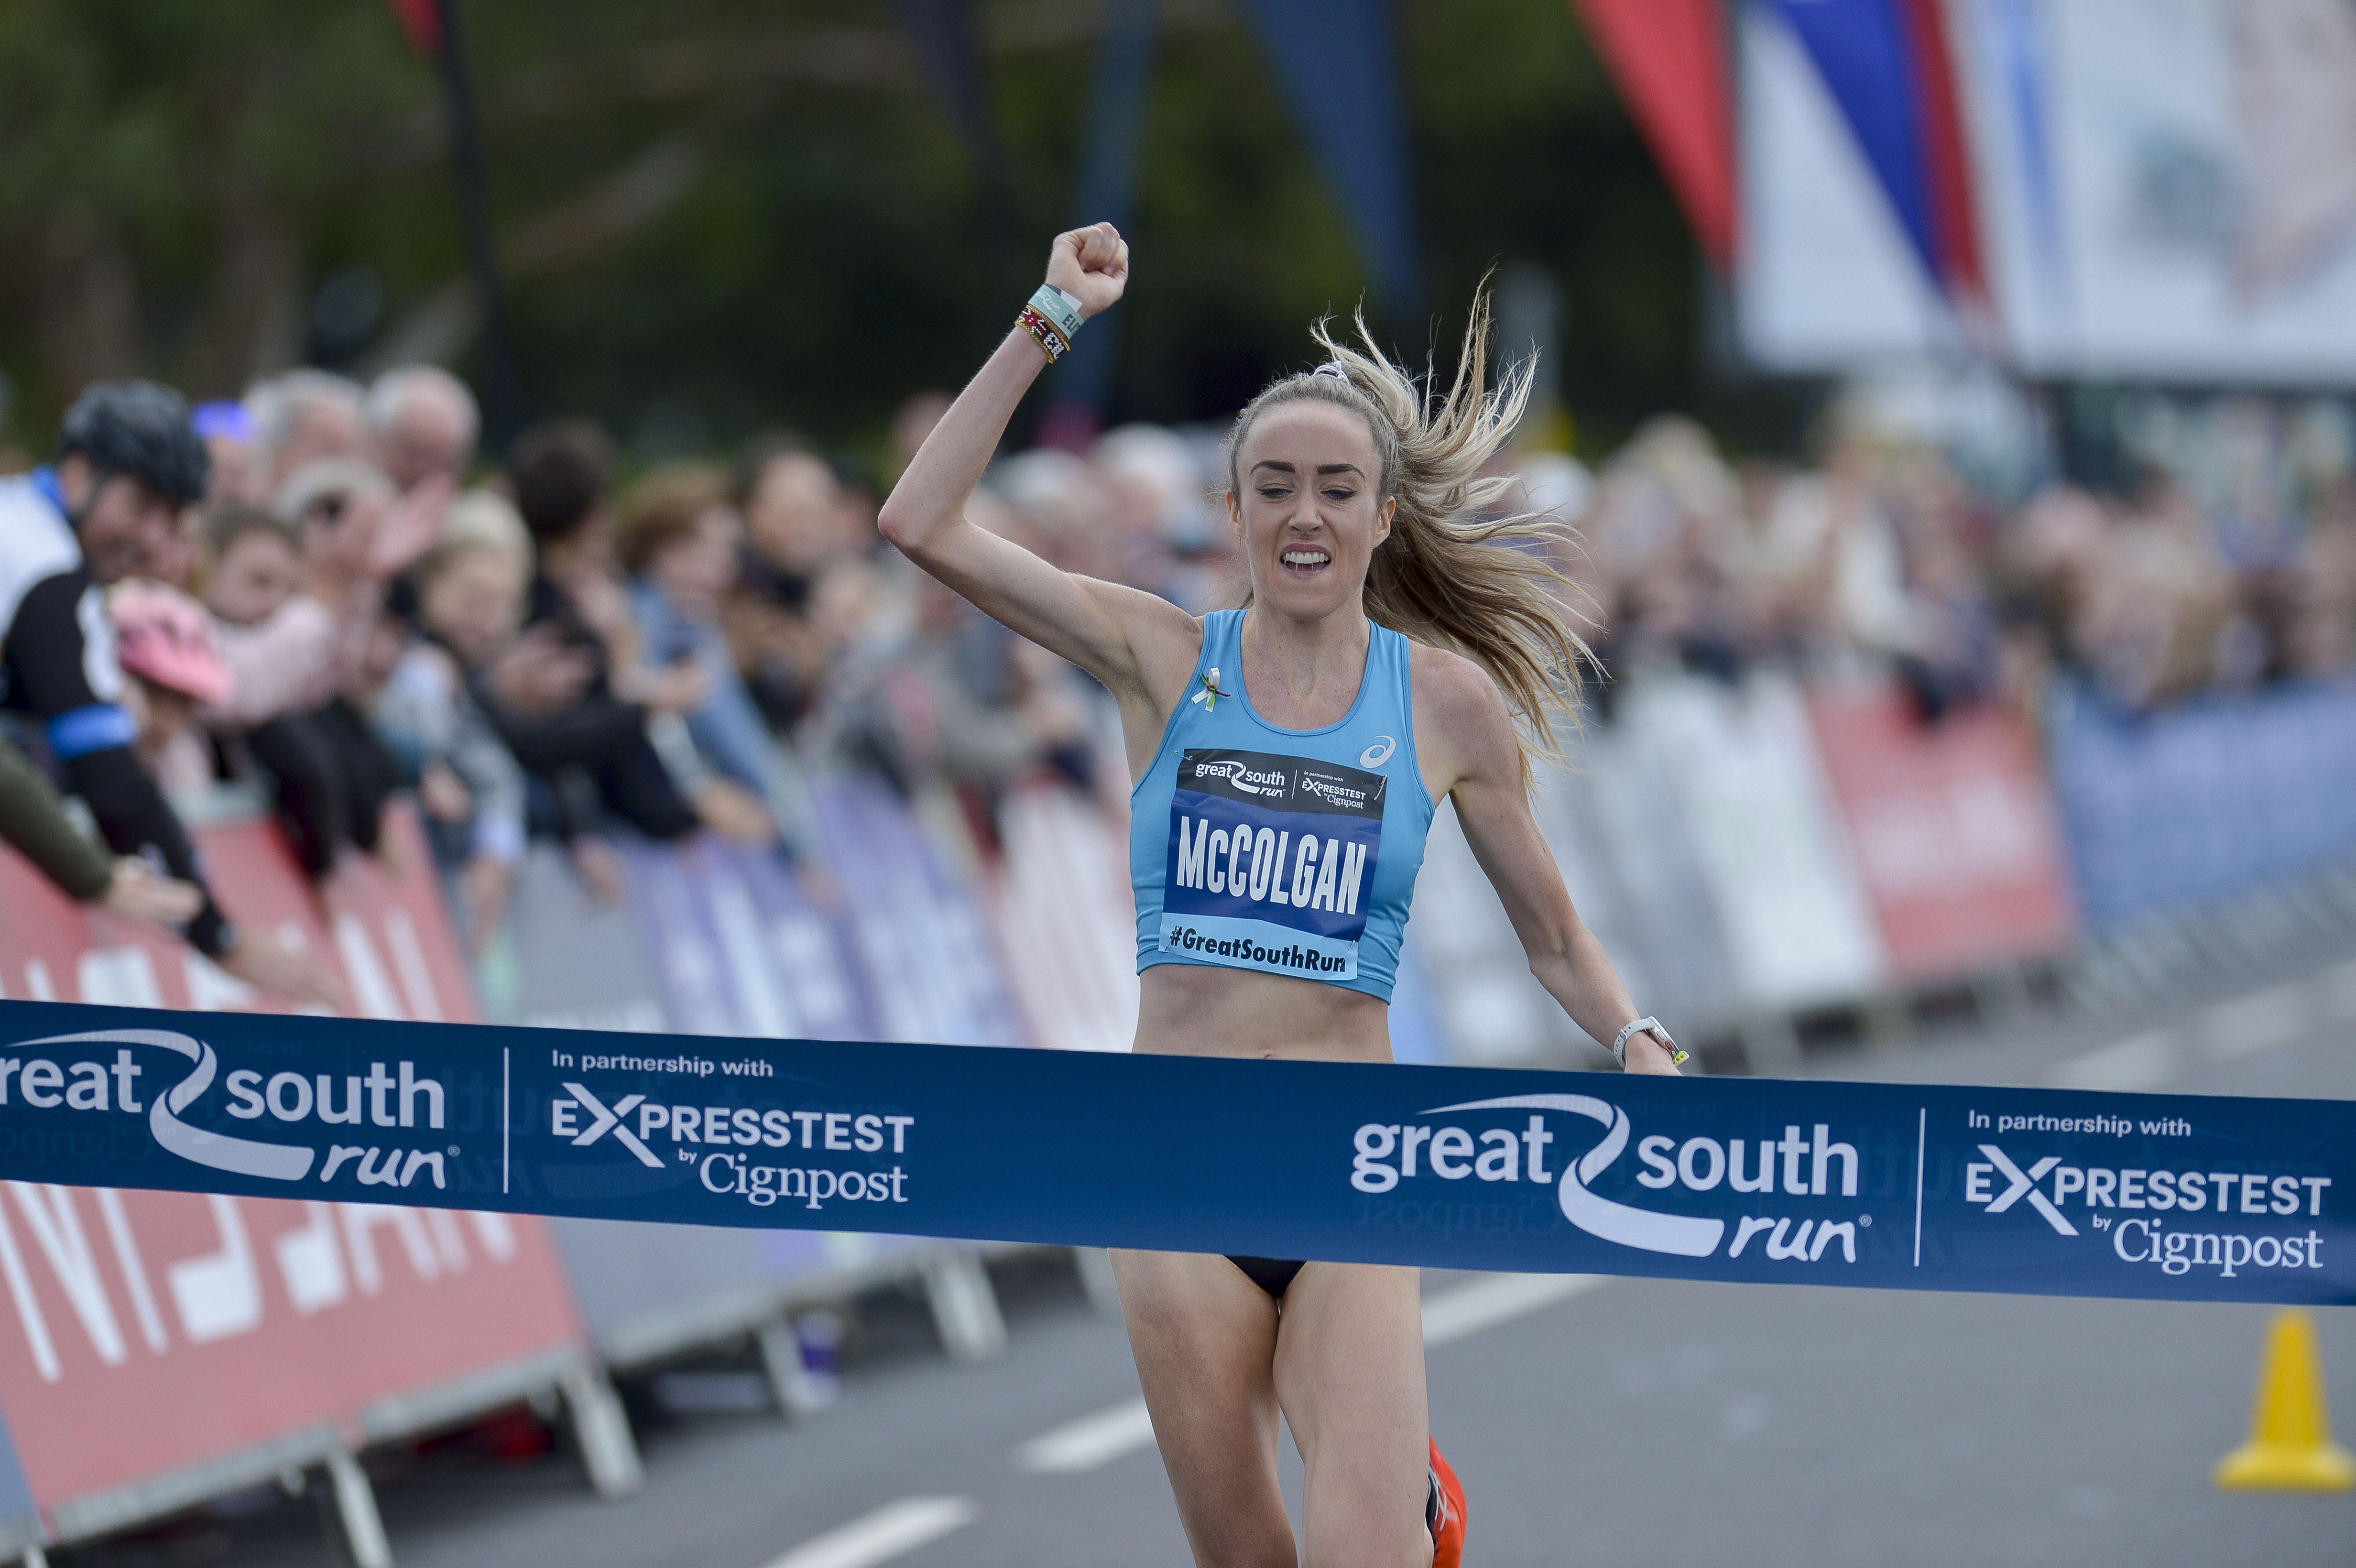 Eilish McColgan breaks Paula Radcliffe's British 10-mile record